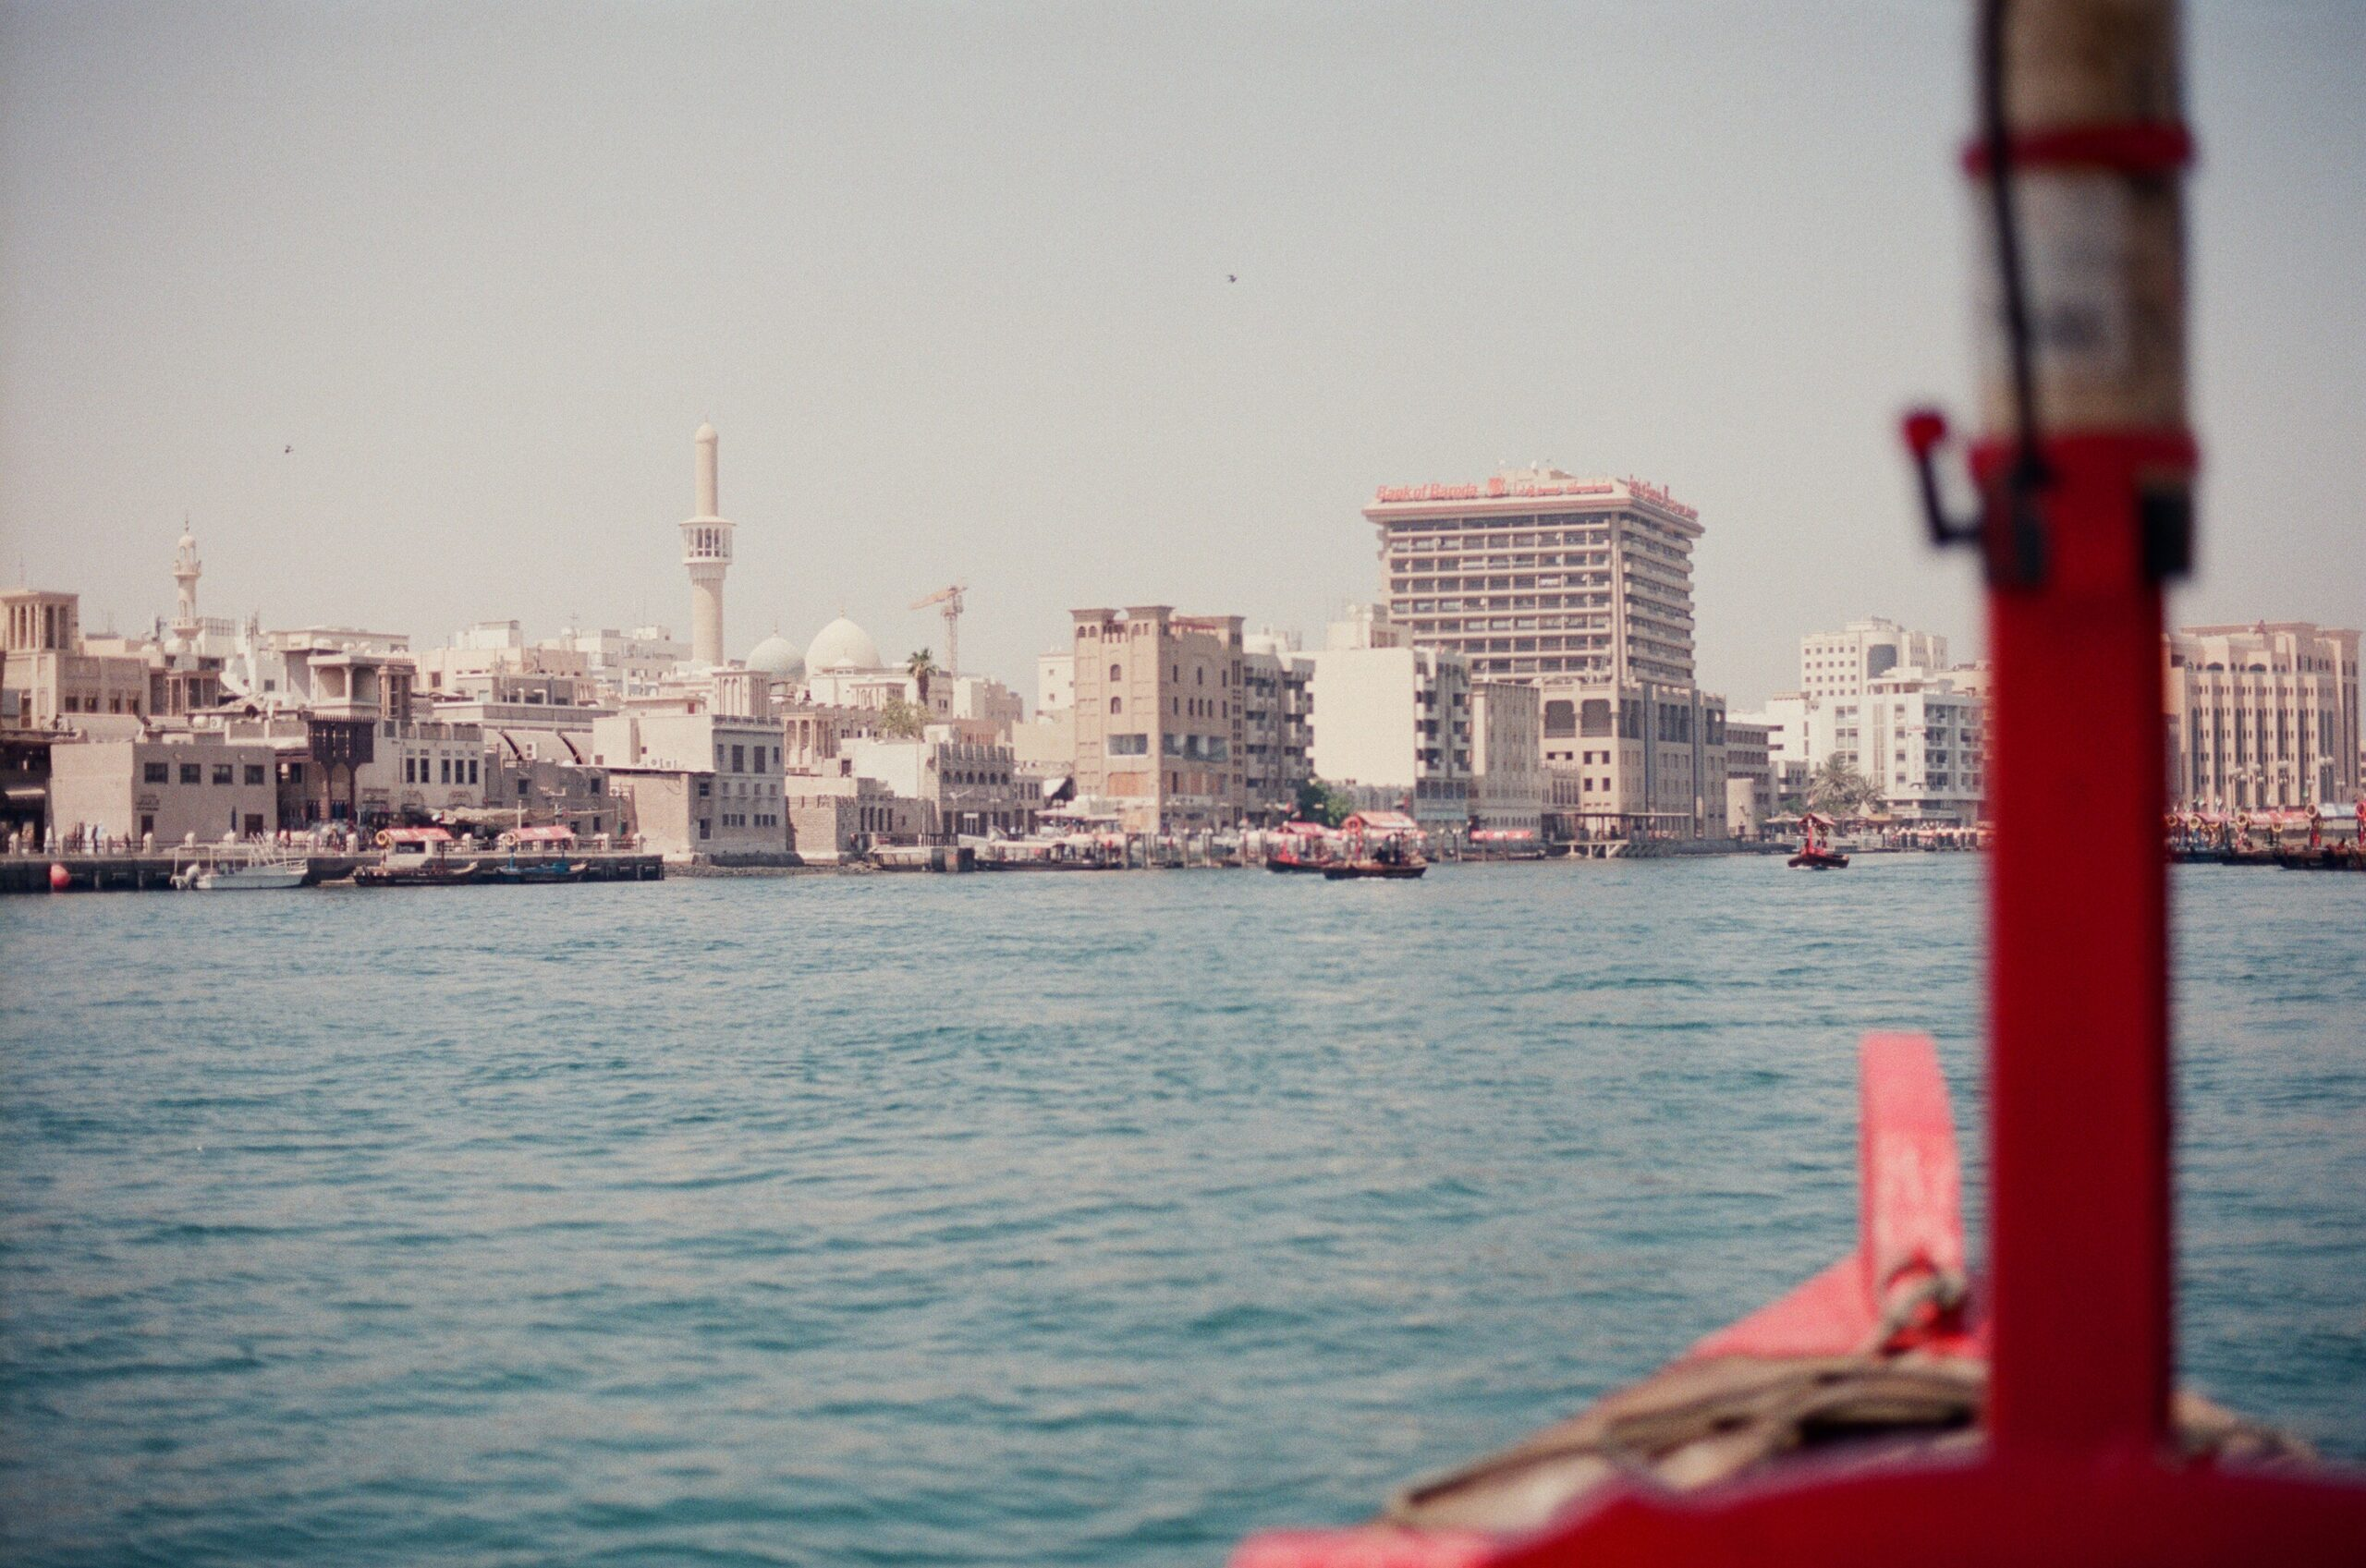 Dubai creek as seen from an Abra boat